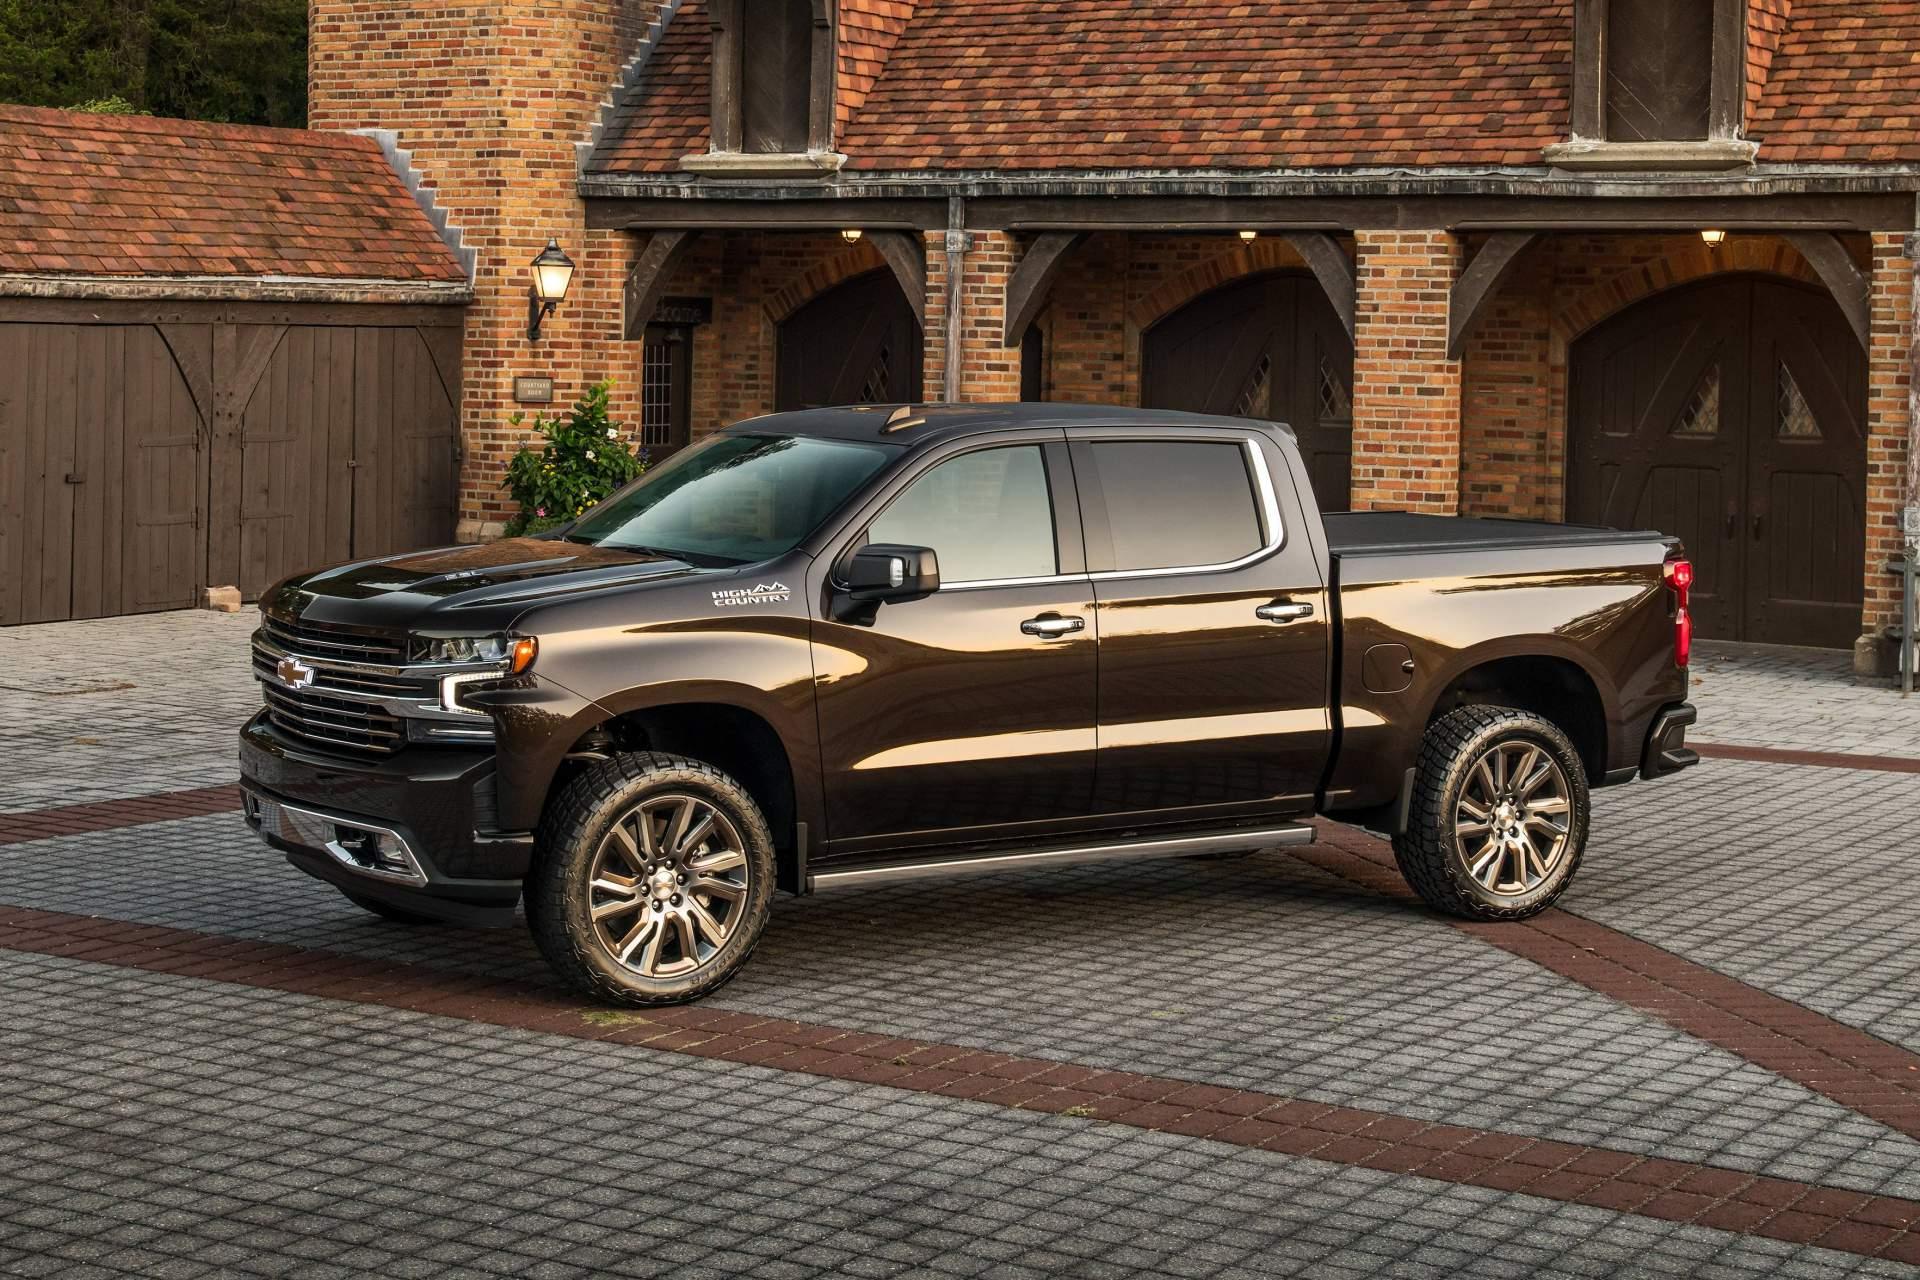 Chevrolet Tunes Four 2019 Silverado 1500 Models, Calls Them Concepts - autoevolution